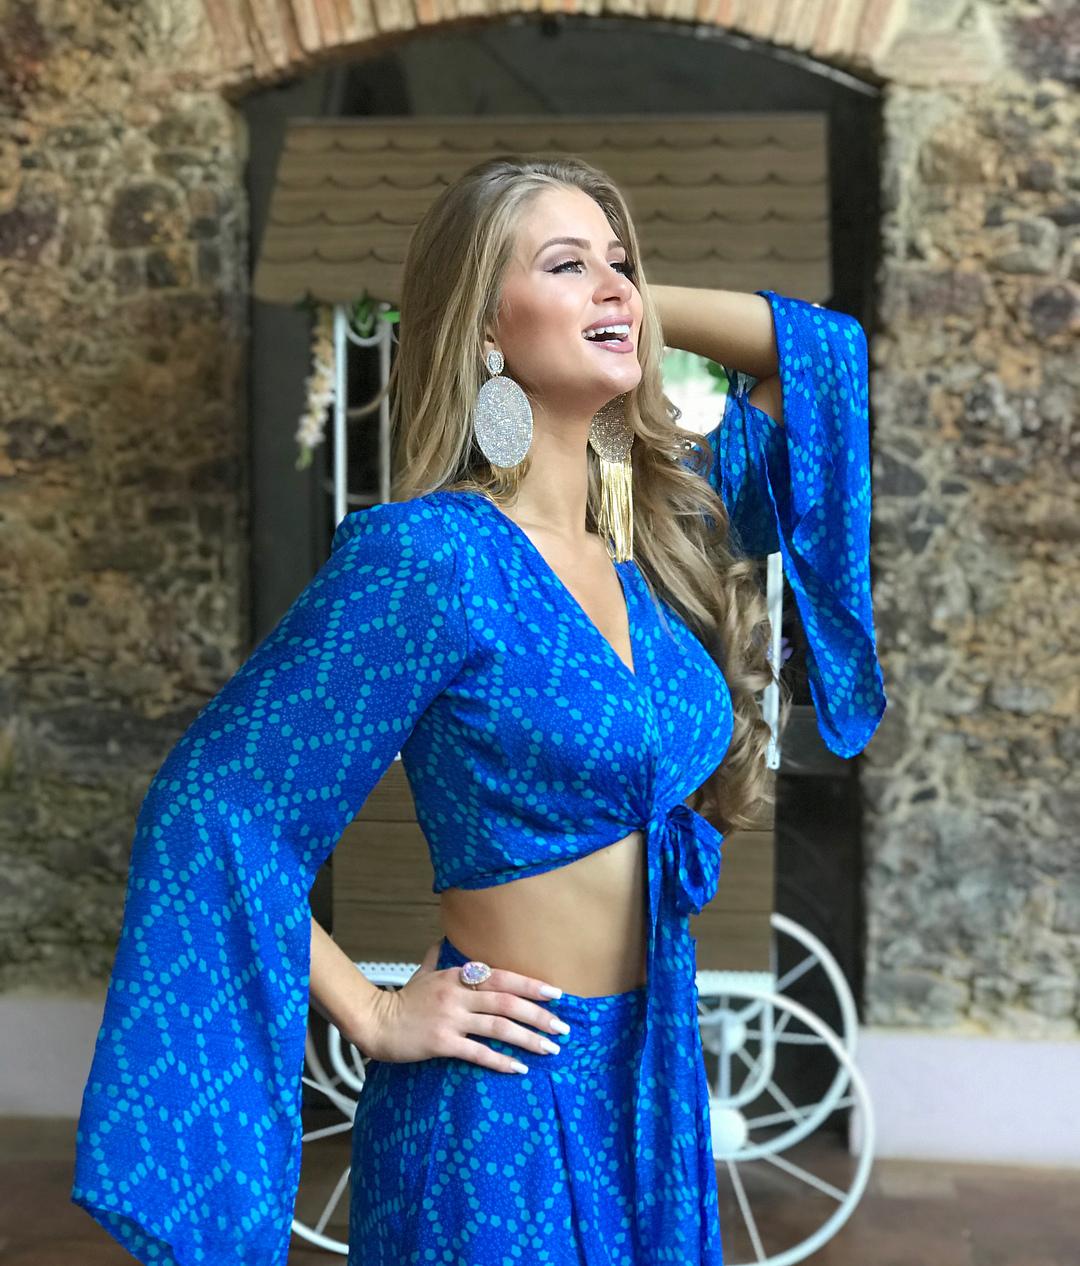 gabriela palma, miss brasil empresarial 2018. - Página 3 37824910